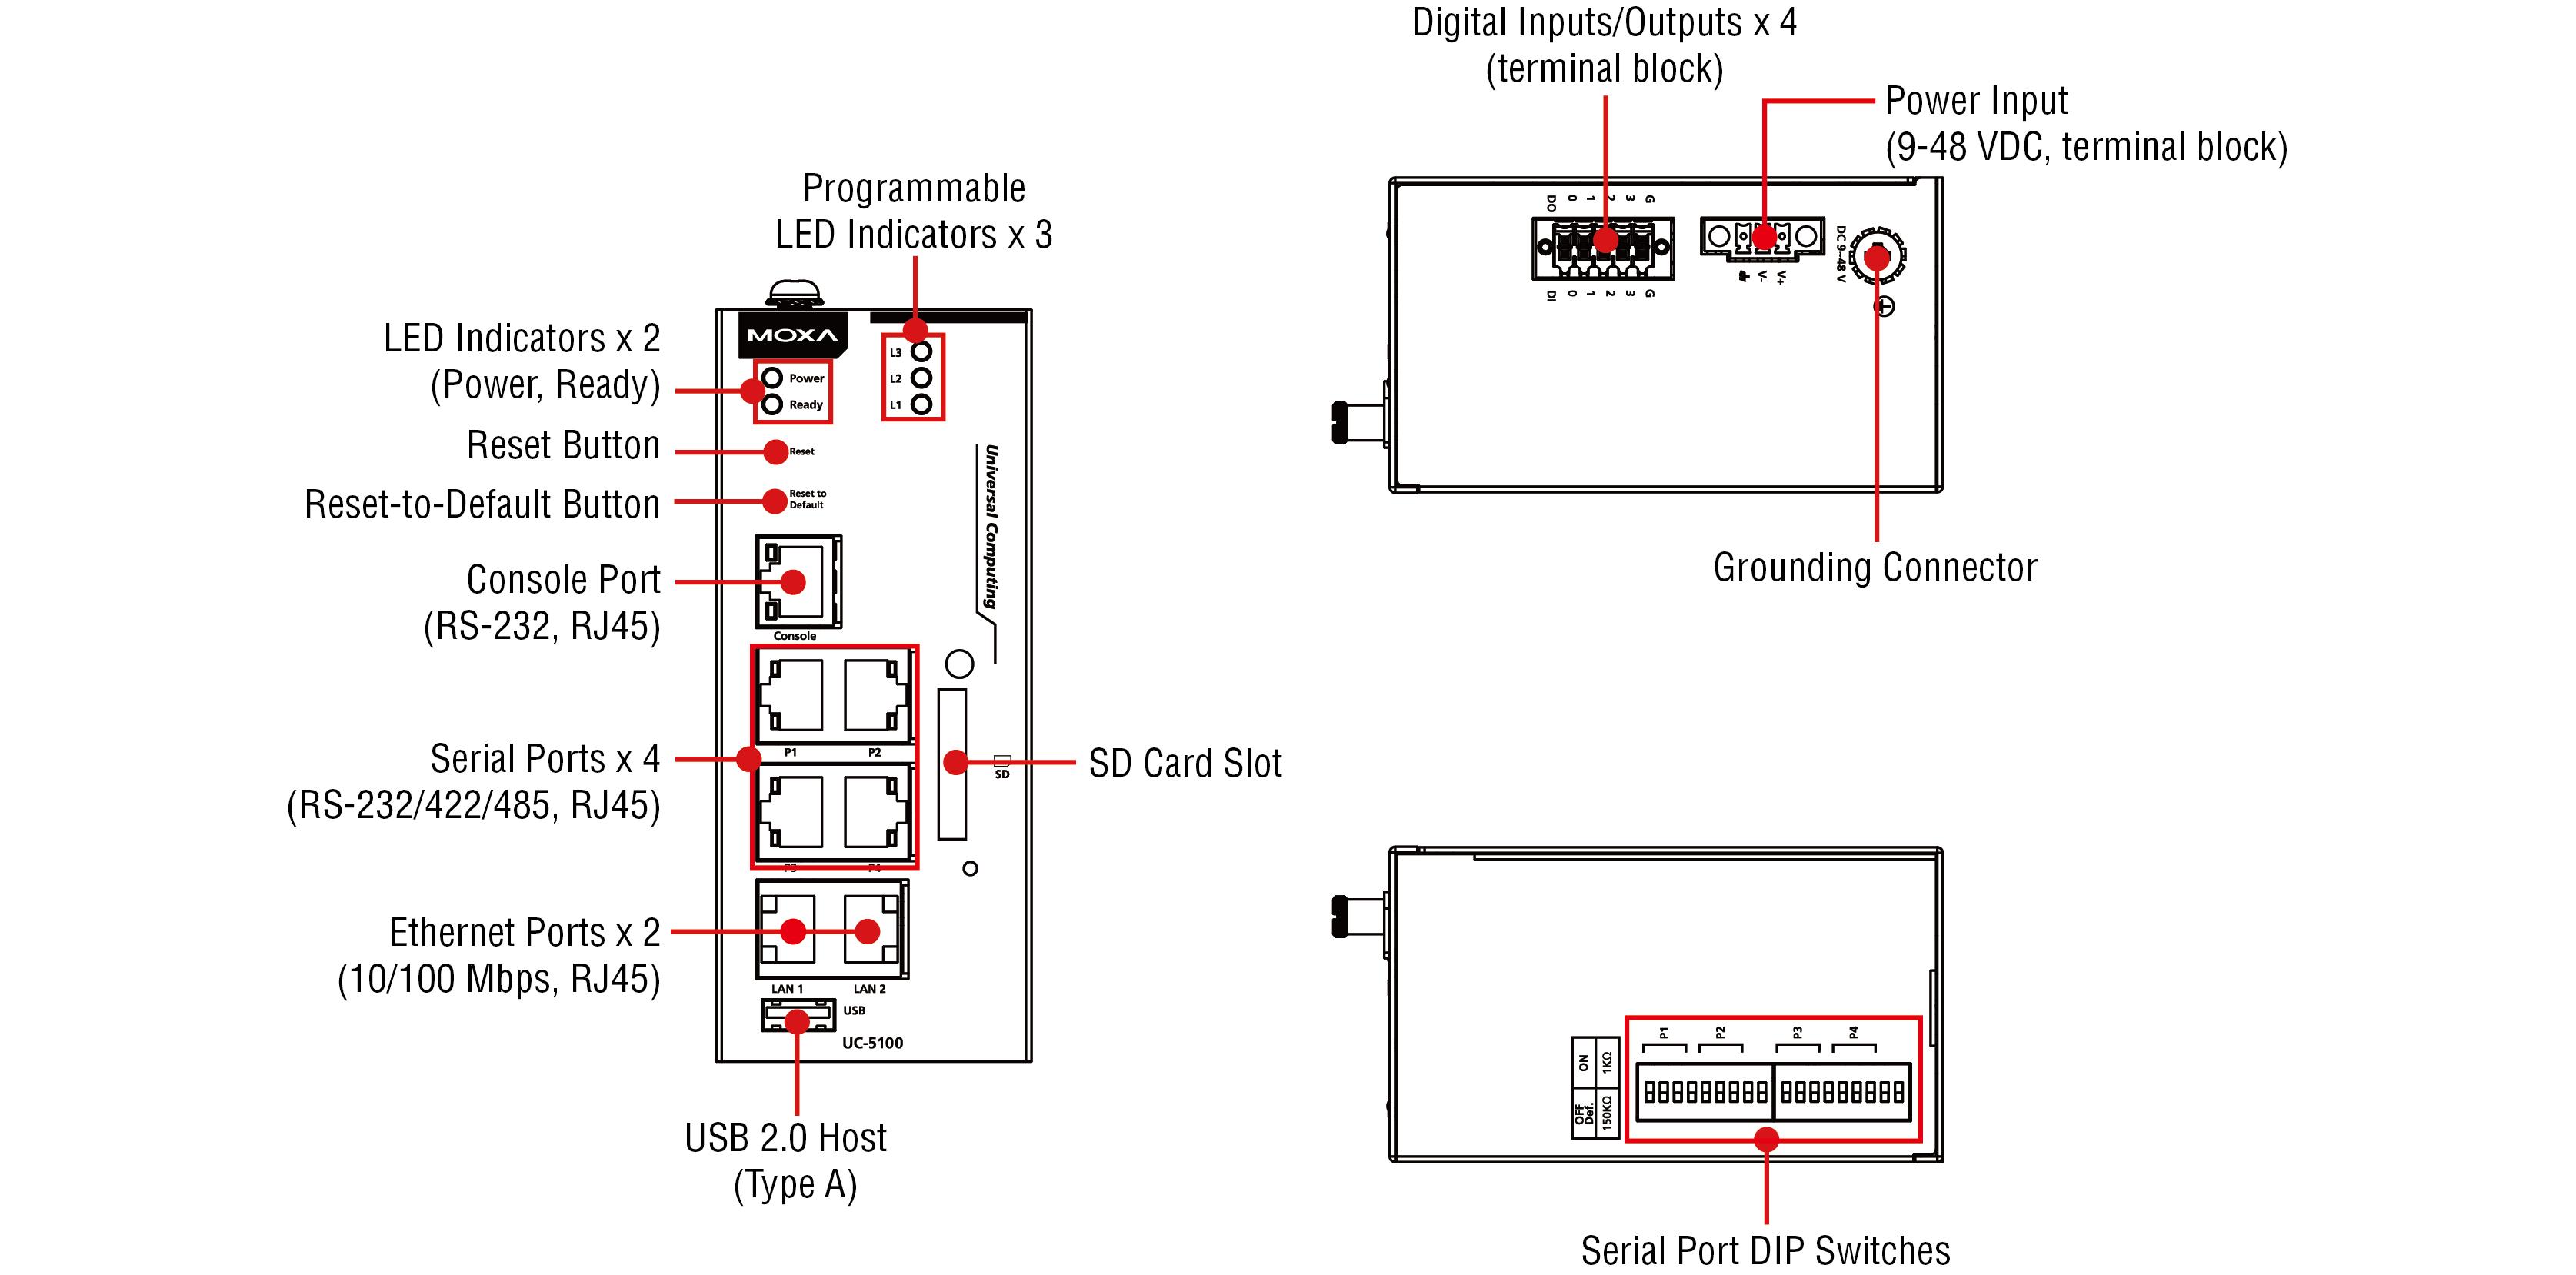 uc 5100 series arm based computers moxa moxa nport 5450 moxa rj11 wiring catalogue of schemas